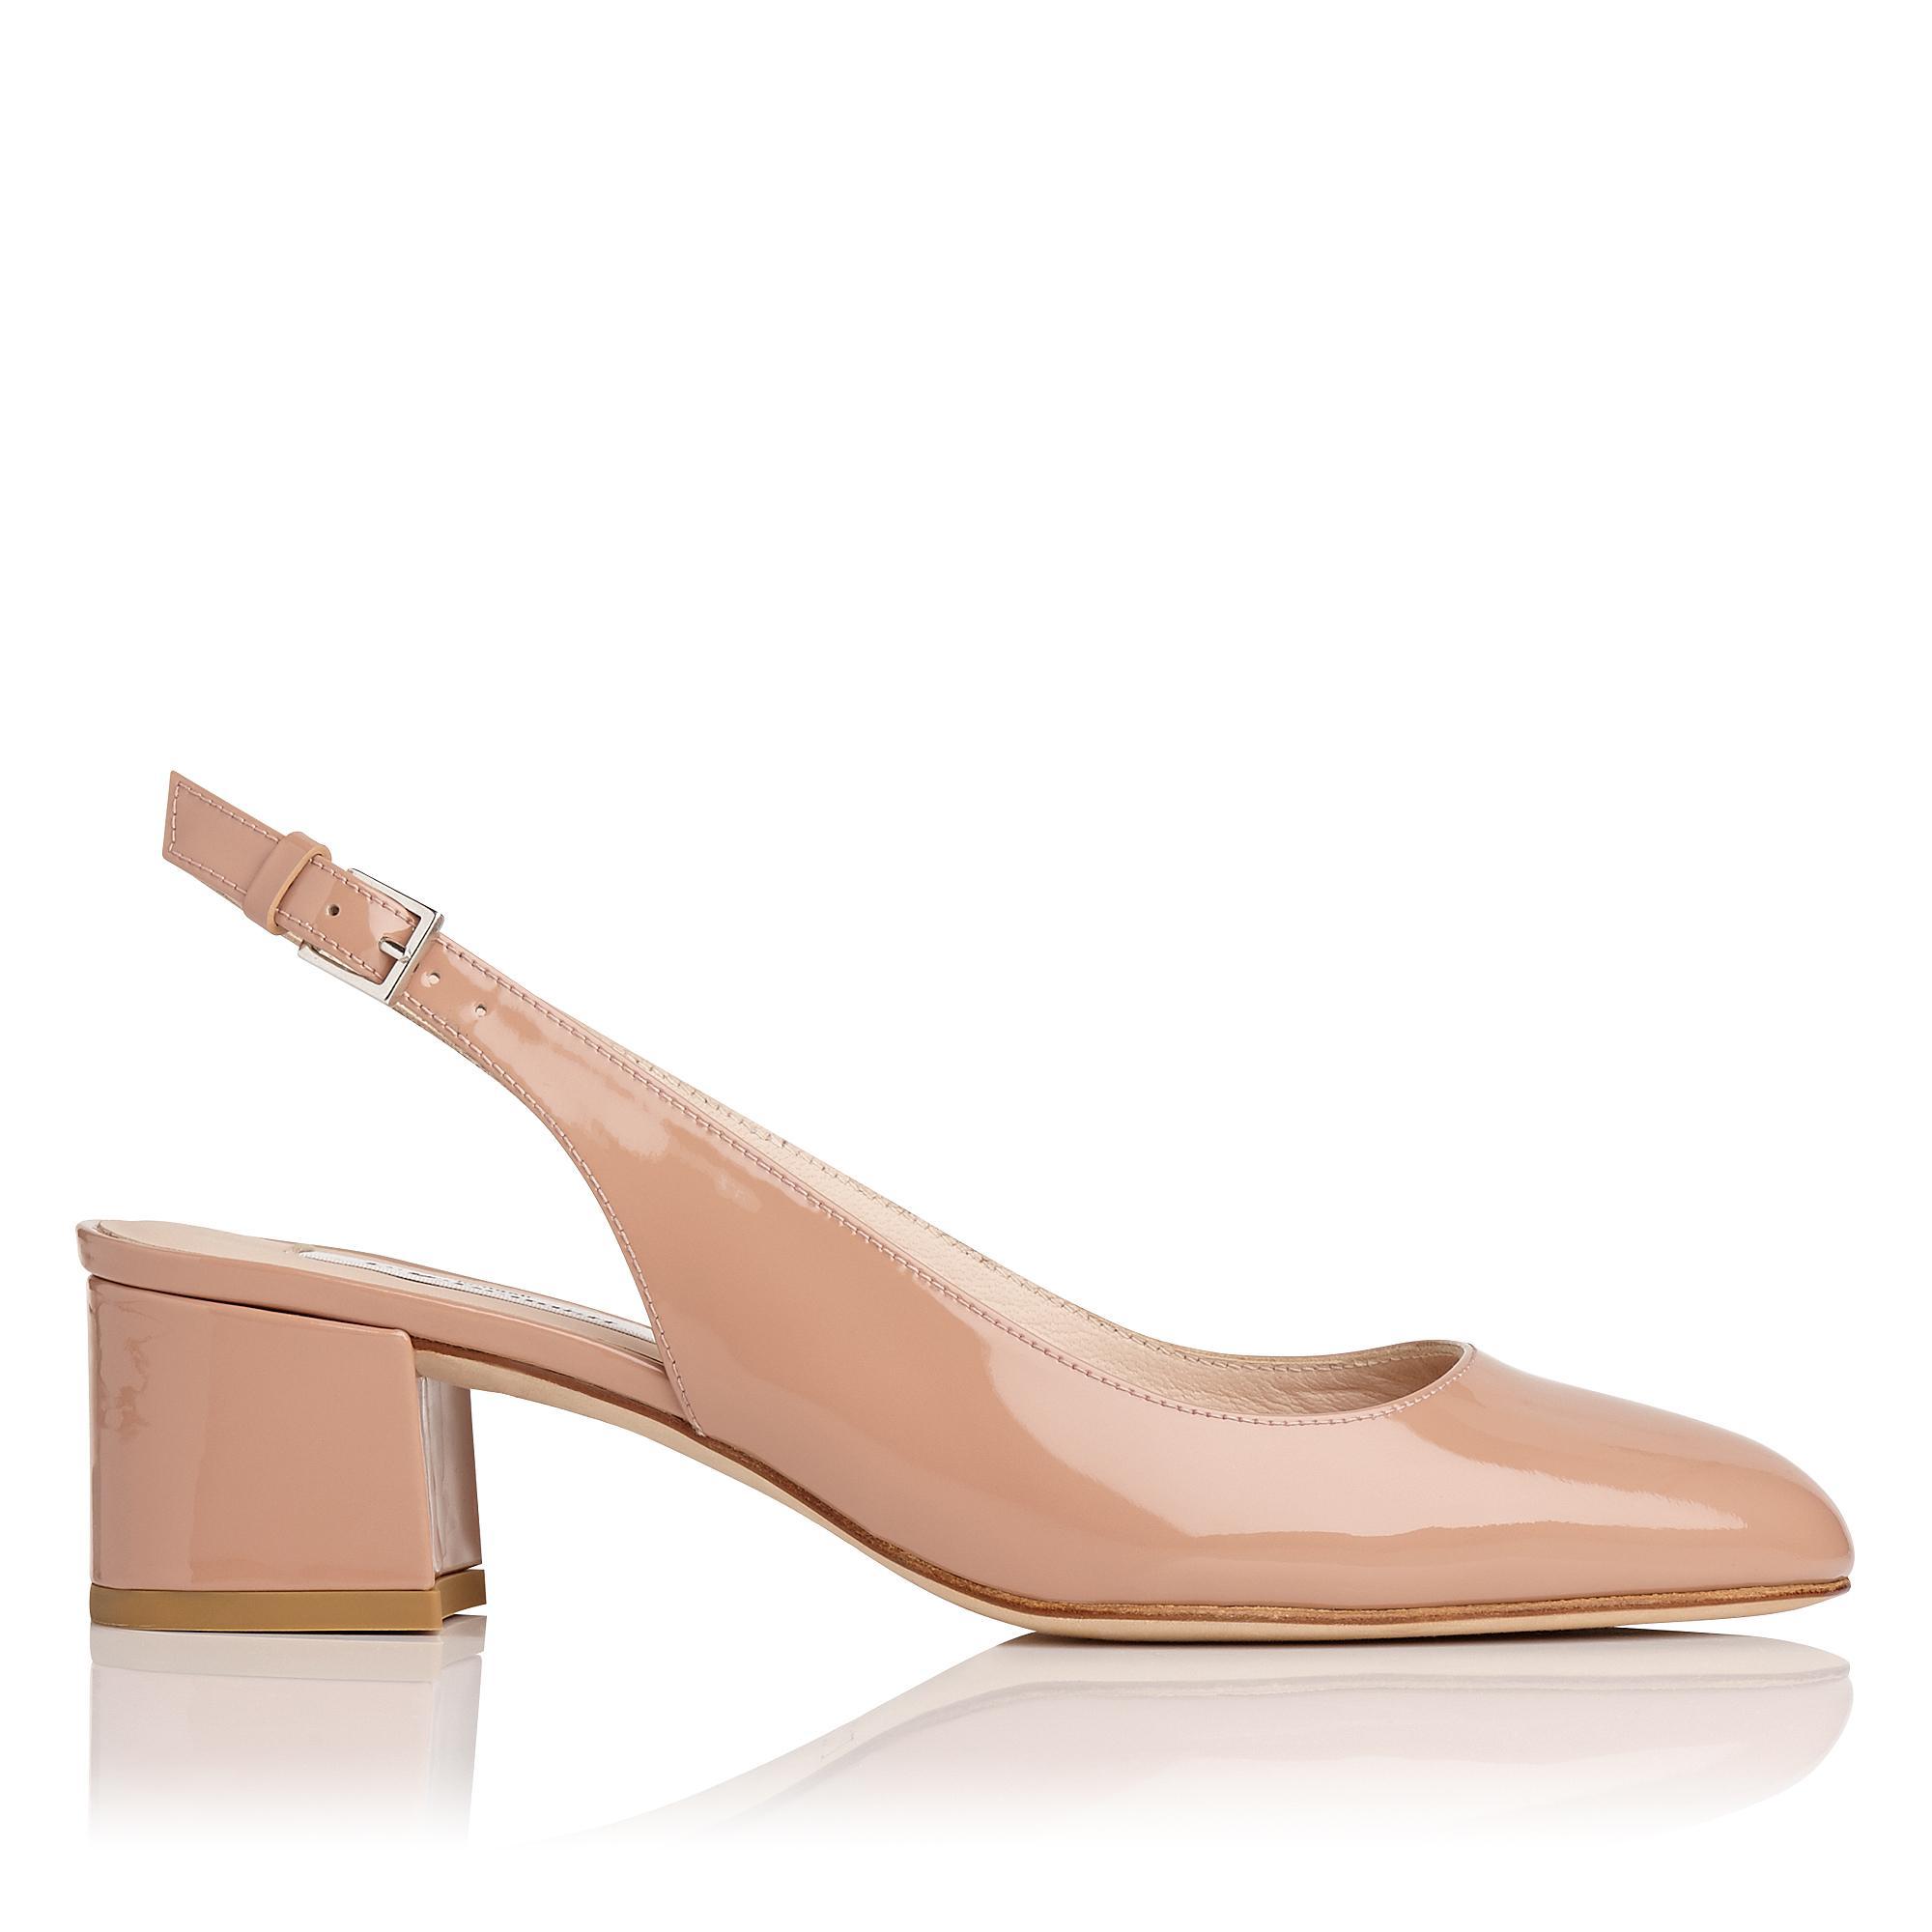 Chloe Nude Patent Heel